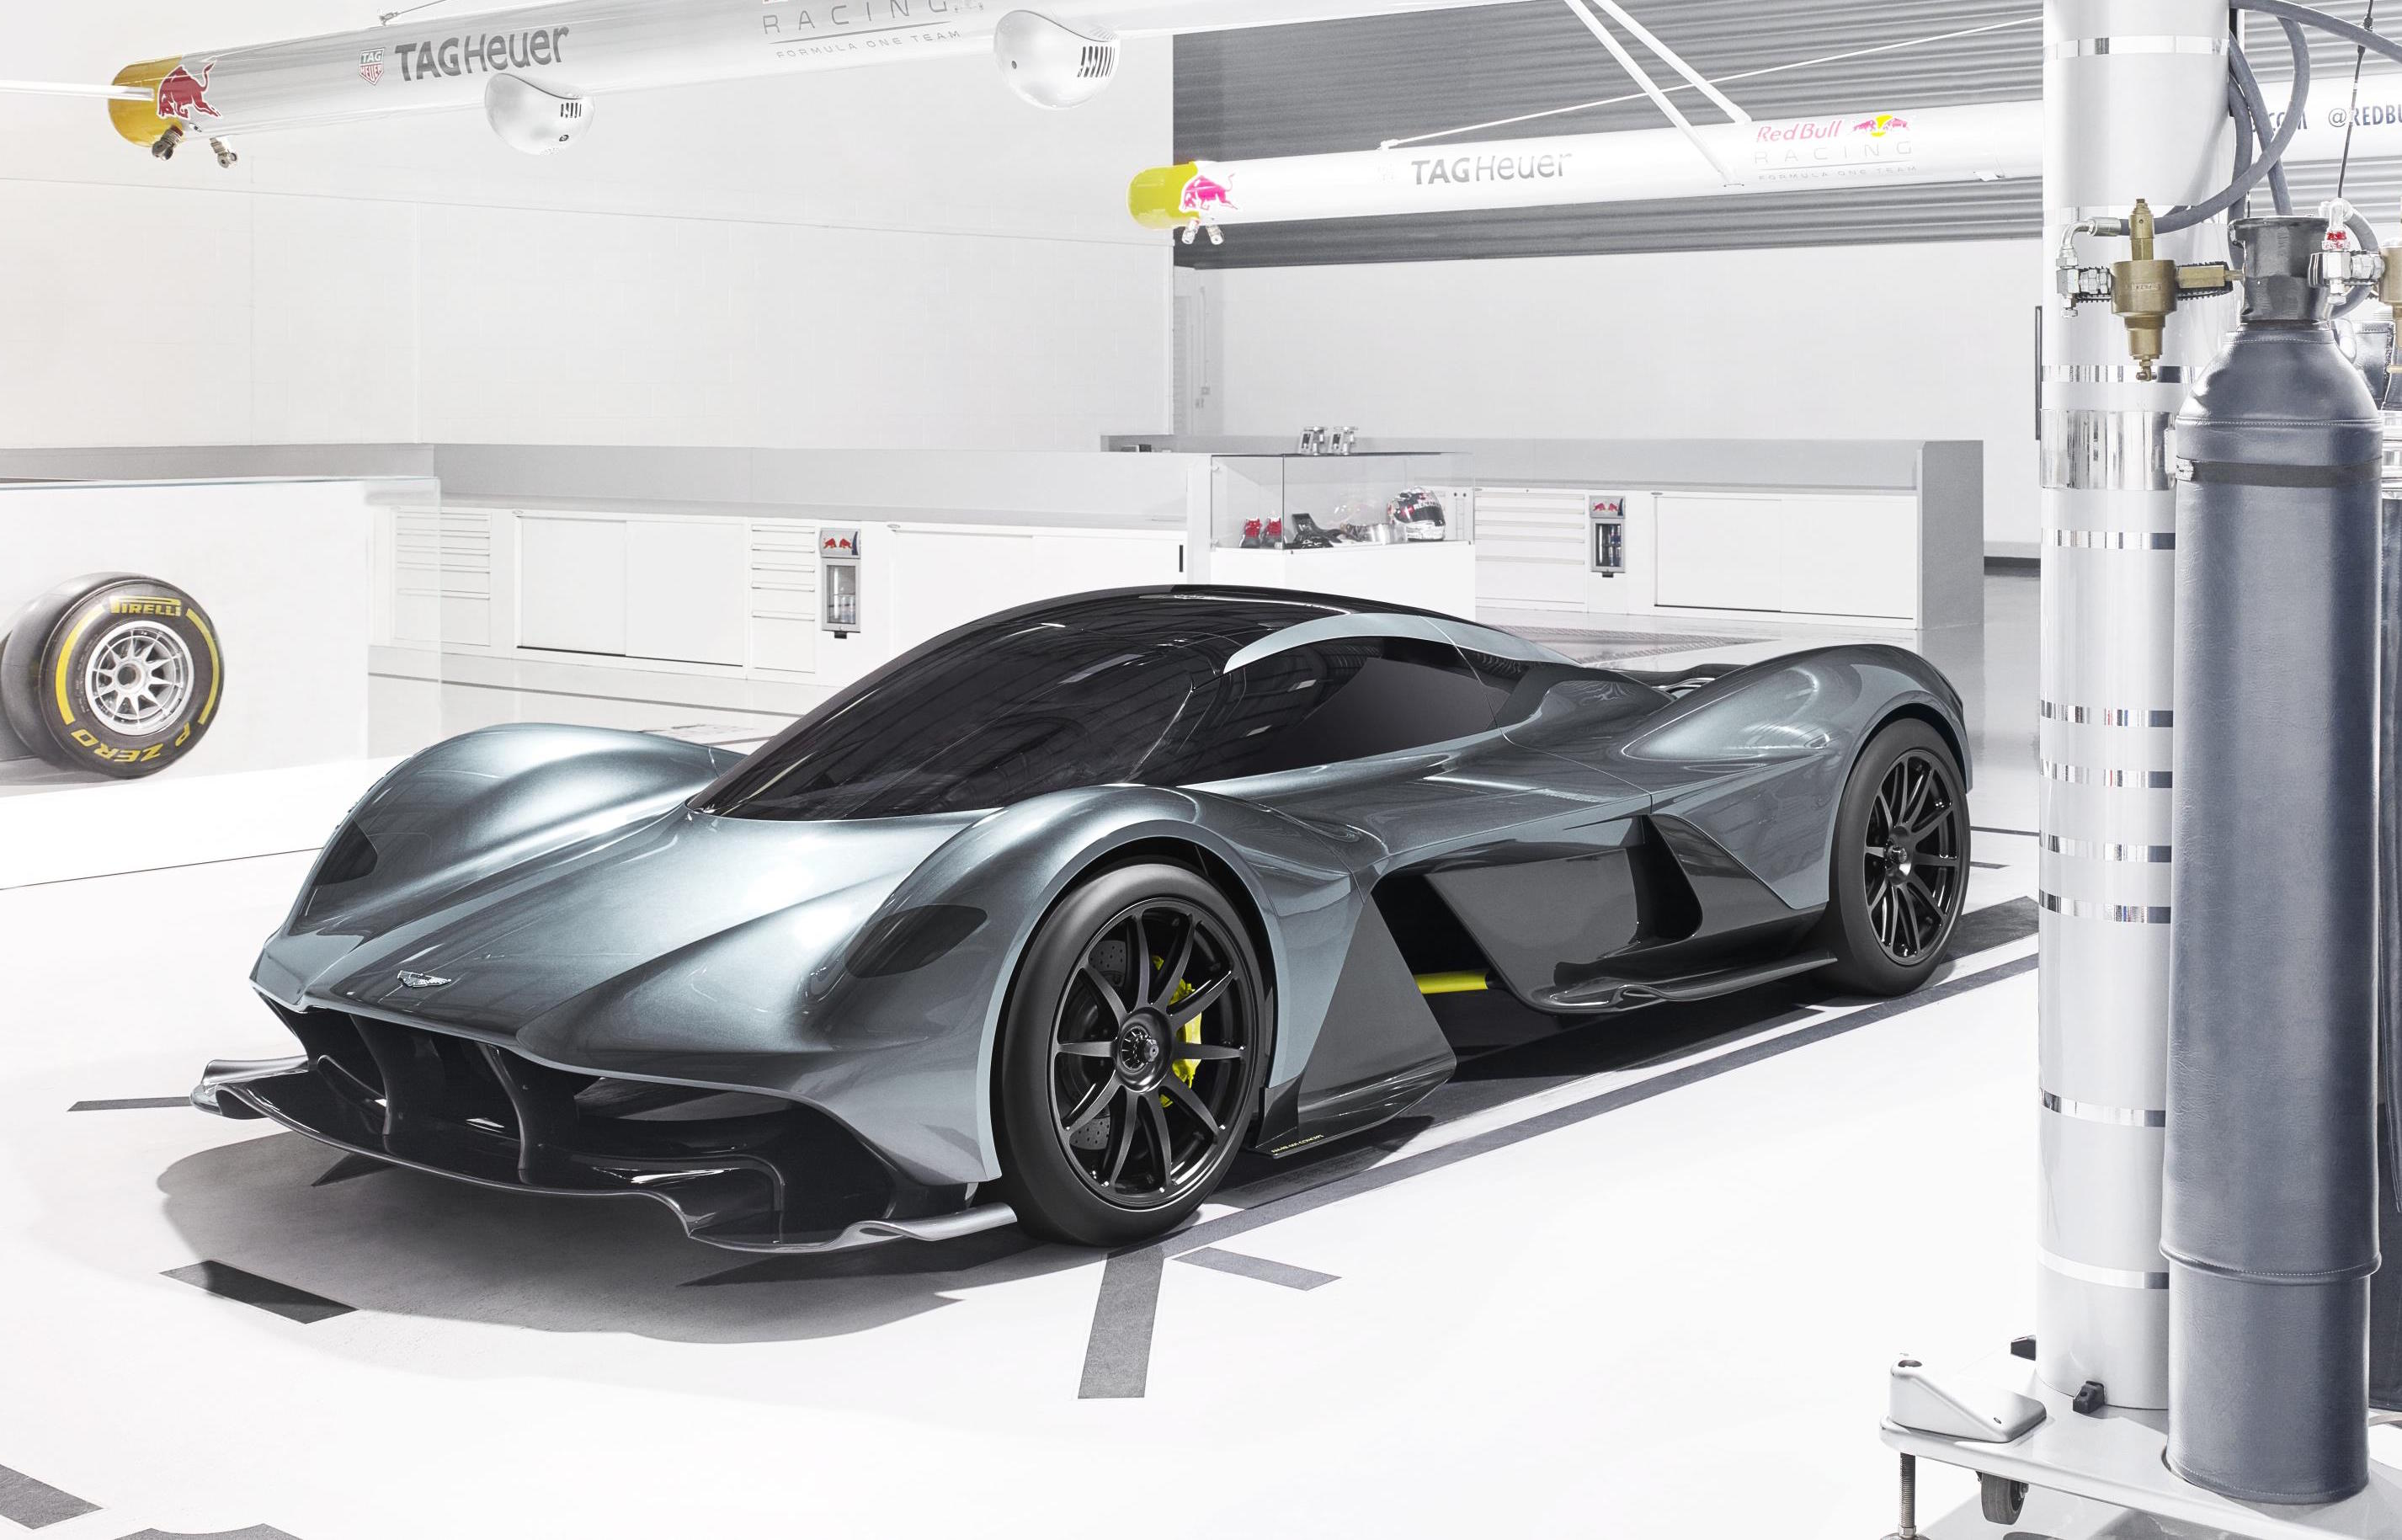 Aston Martin AM-RB 001 hypercar revealed; 1hp:1kg